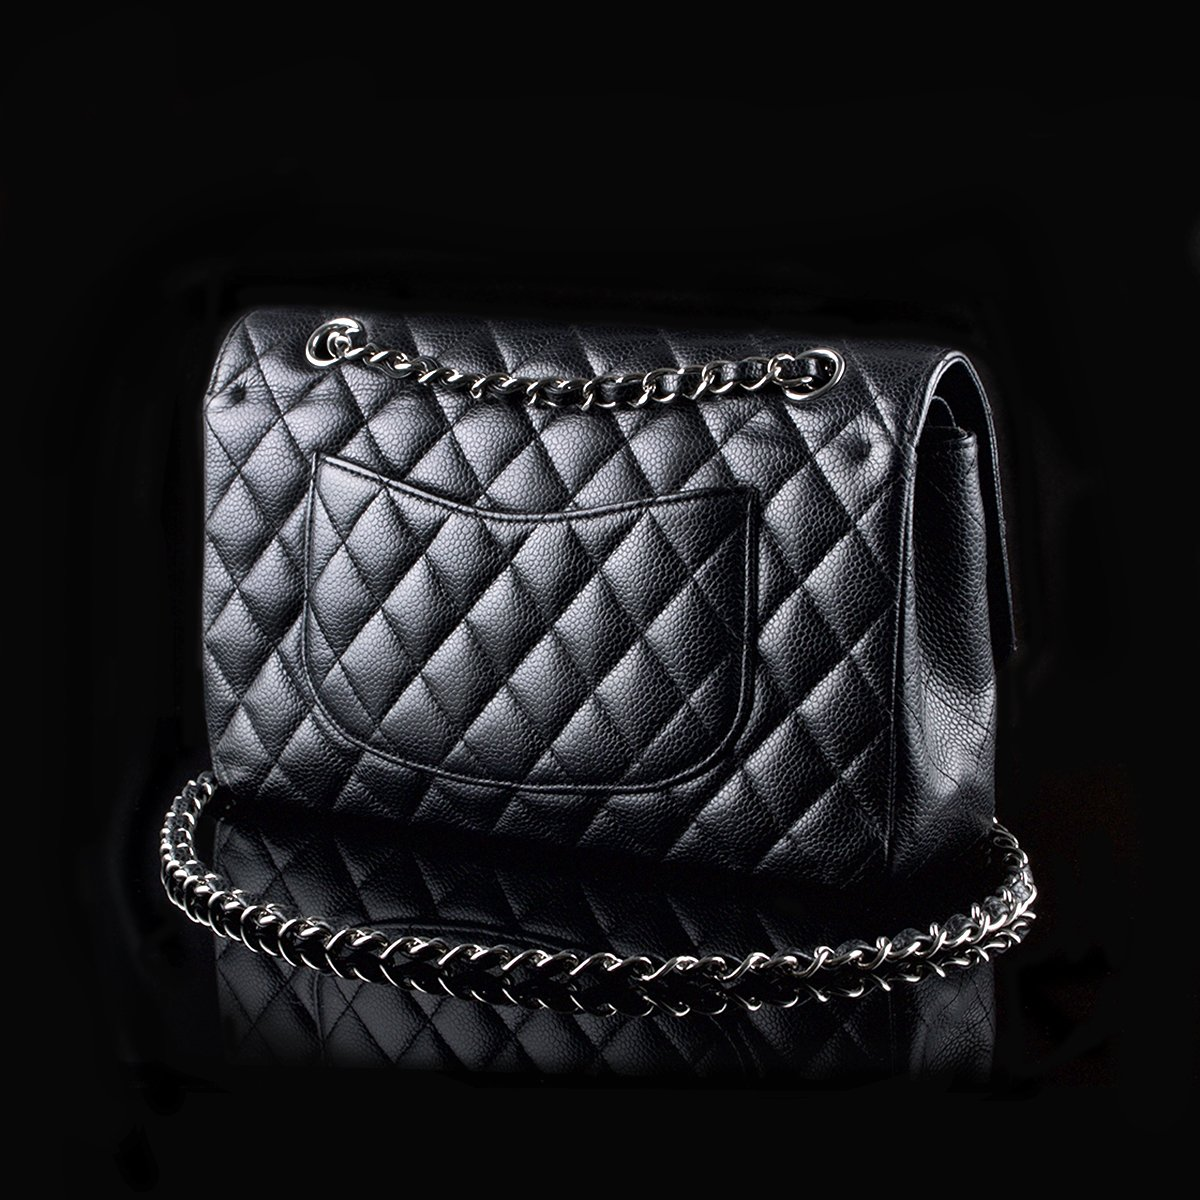 82a2818a971807 Chanel 2.55 Timeless Classic Flap Medium Black Caviar - Classic390